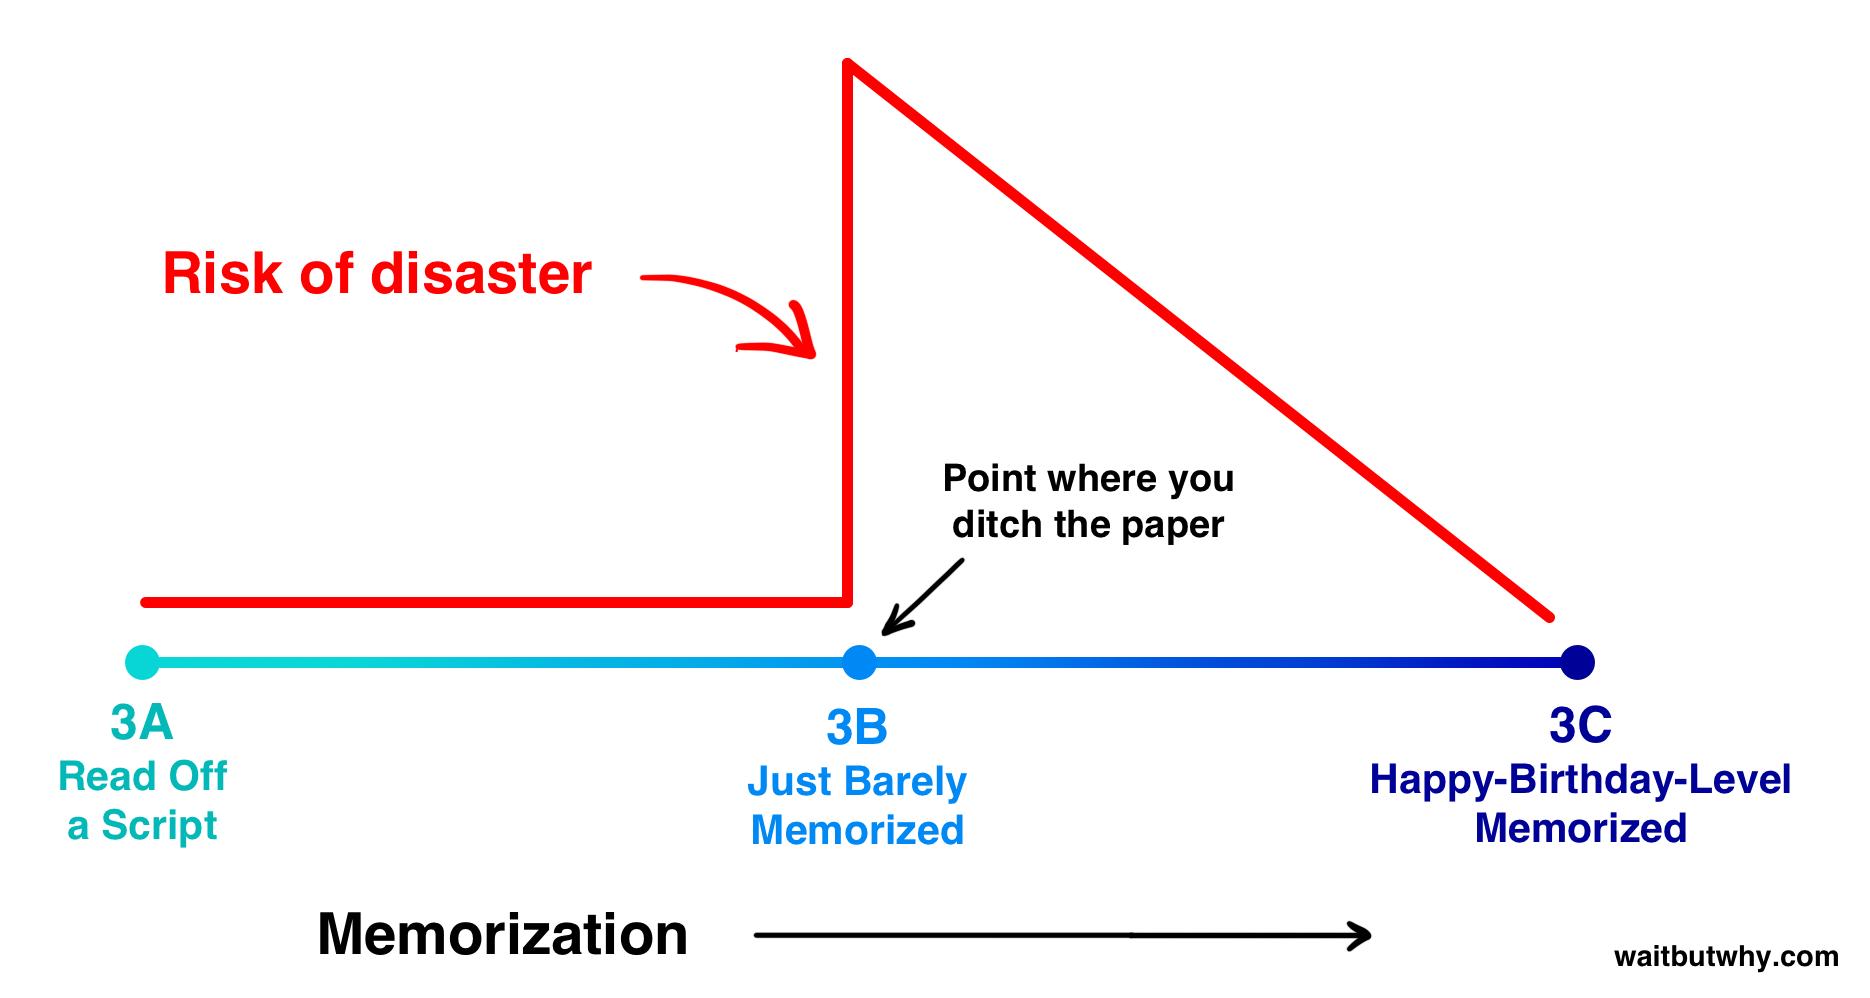 Memorization risk graph where just barely memorized has the highest risk of disaster